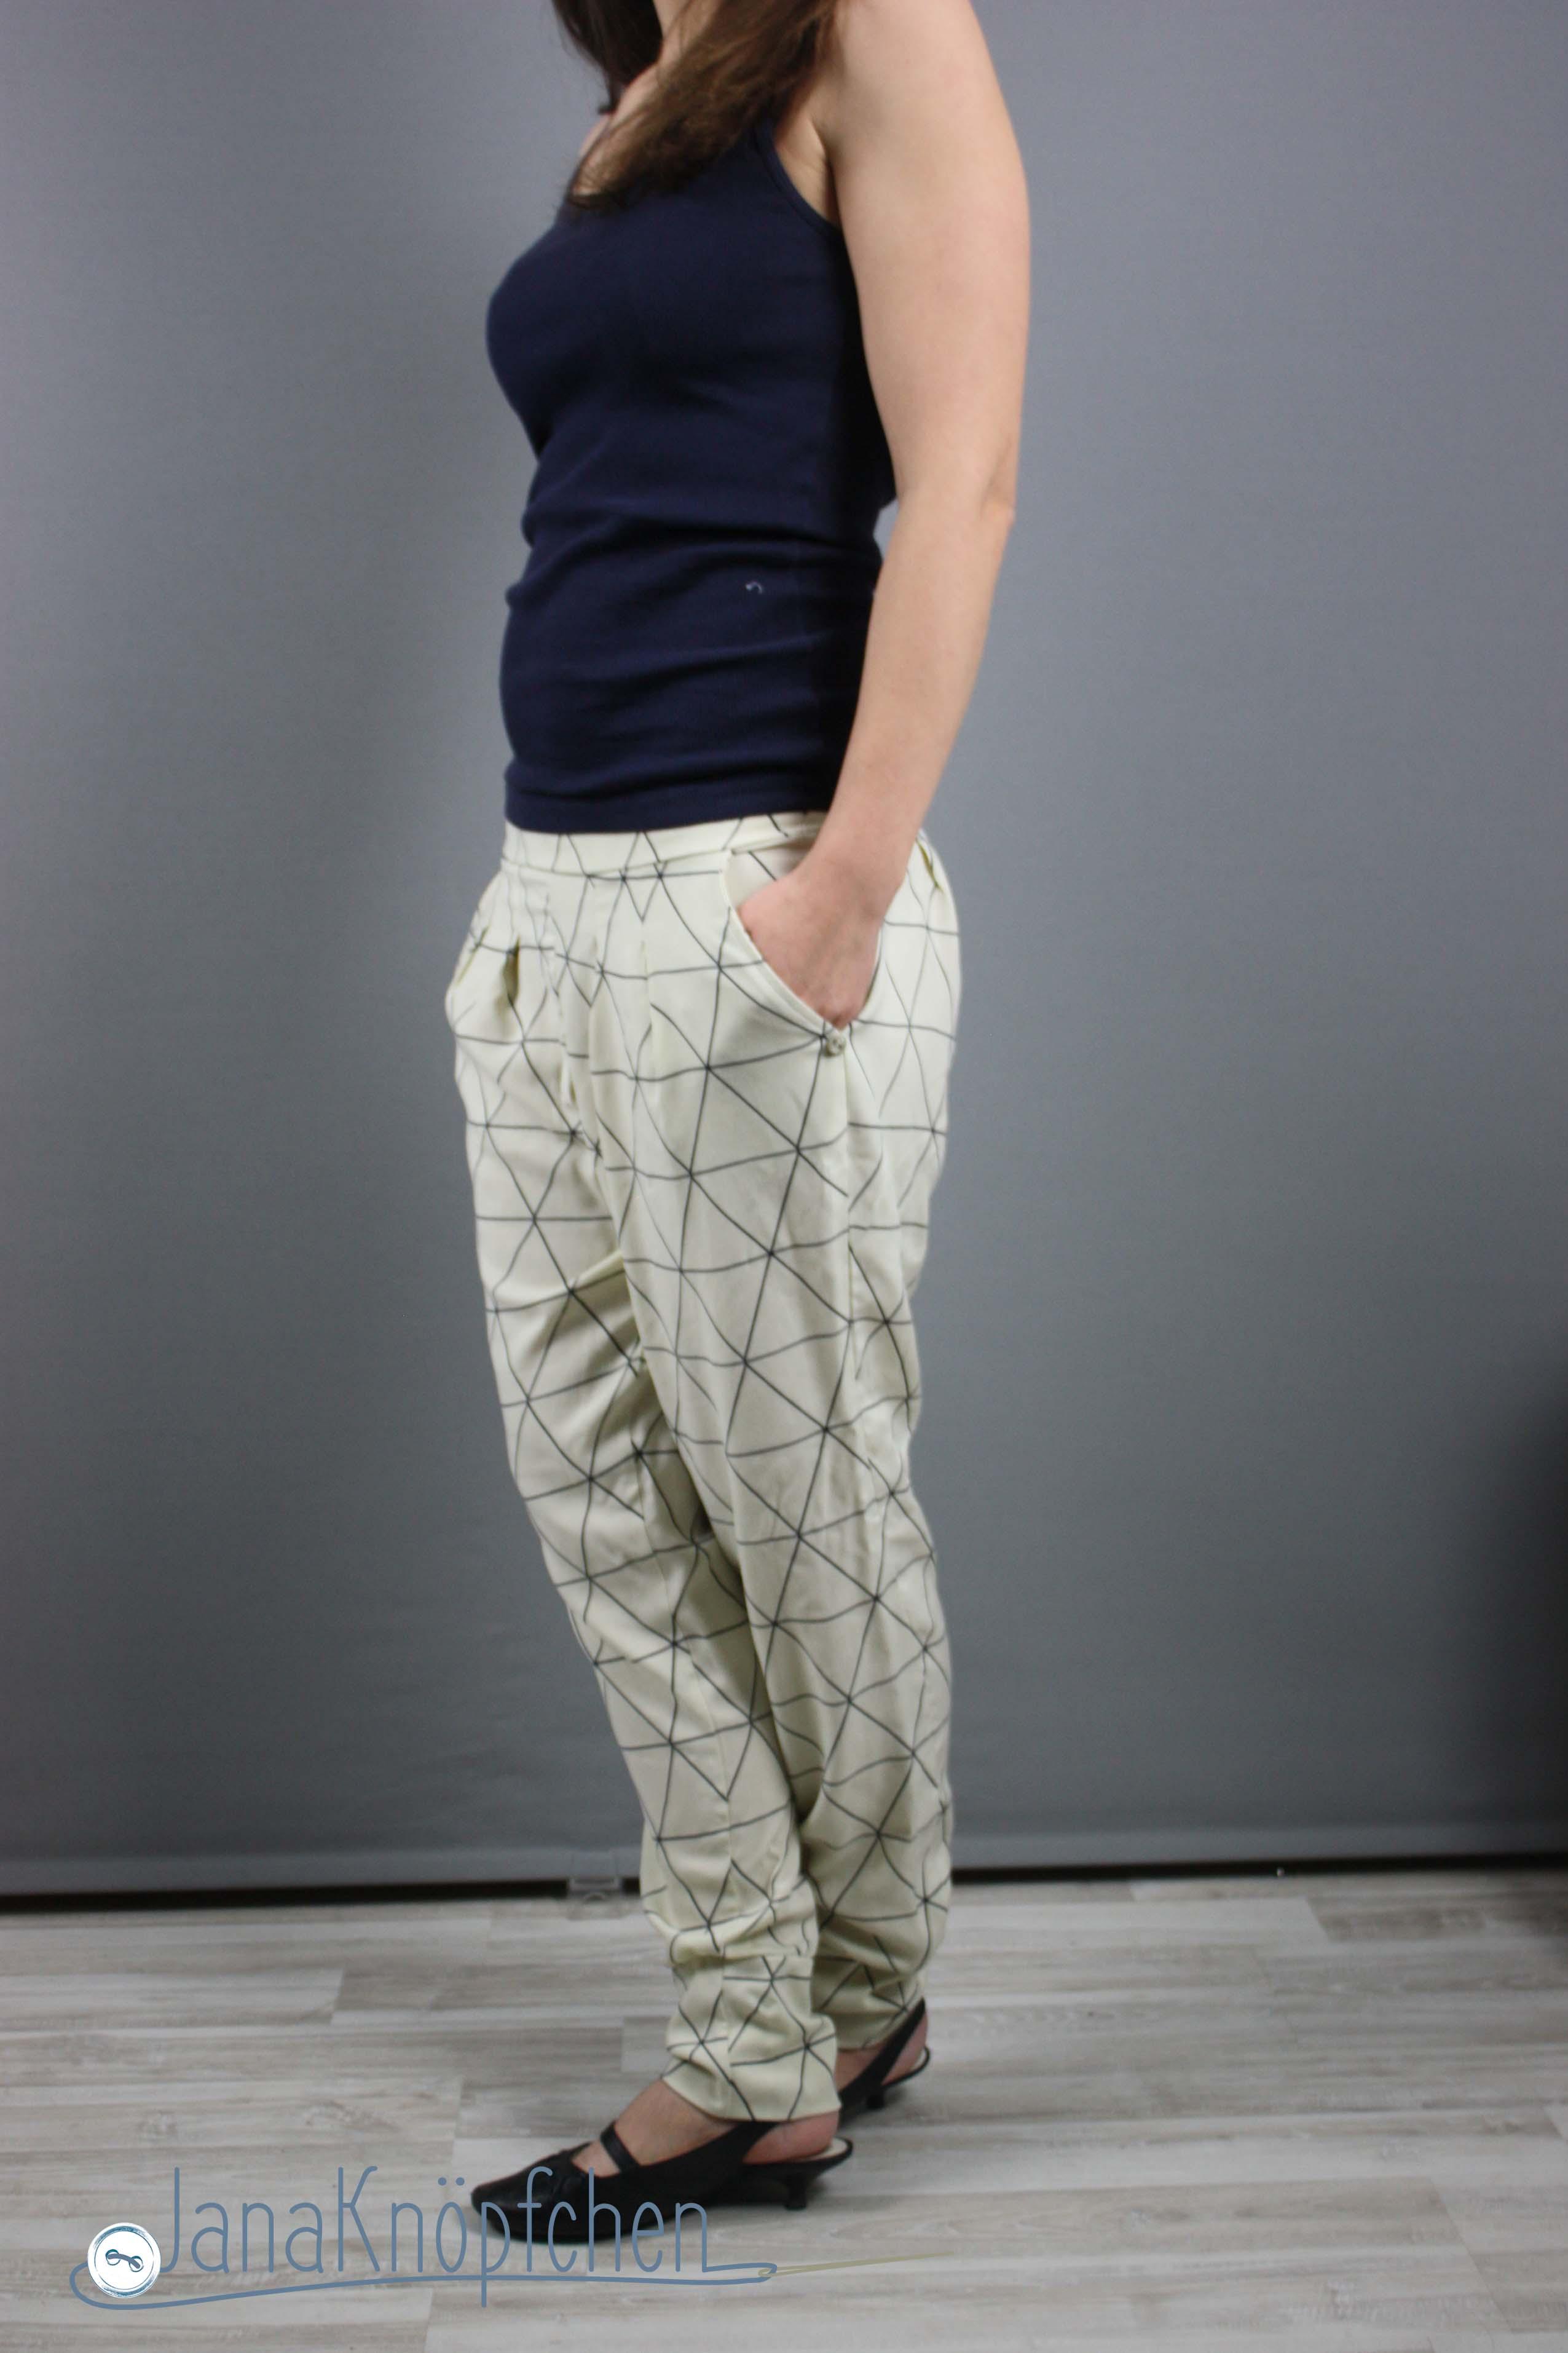 bundfalten hosen selbstgenaeht. JanaKnöpfchen - Nähen für jungs. Nähblog 12 colors of handmade fashion